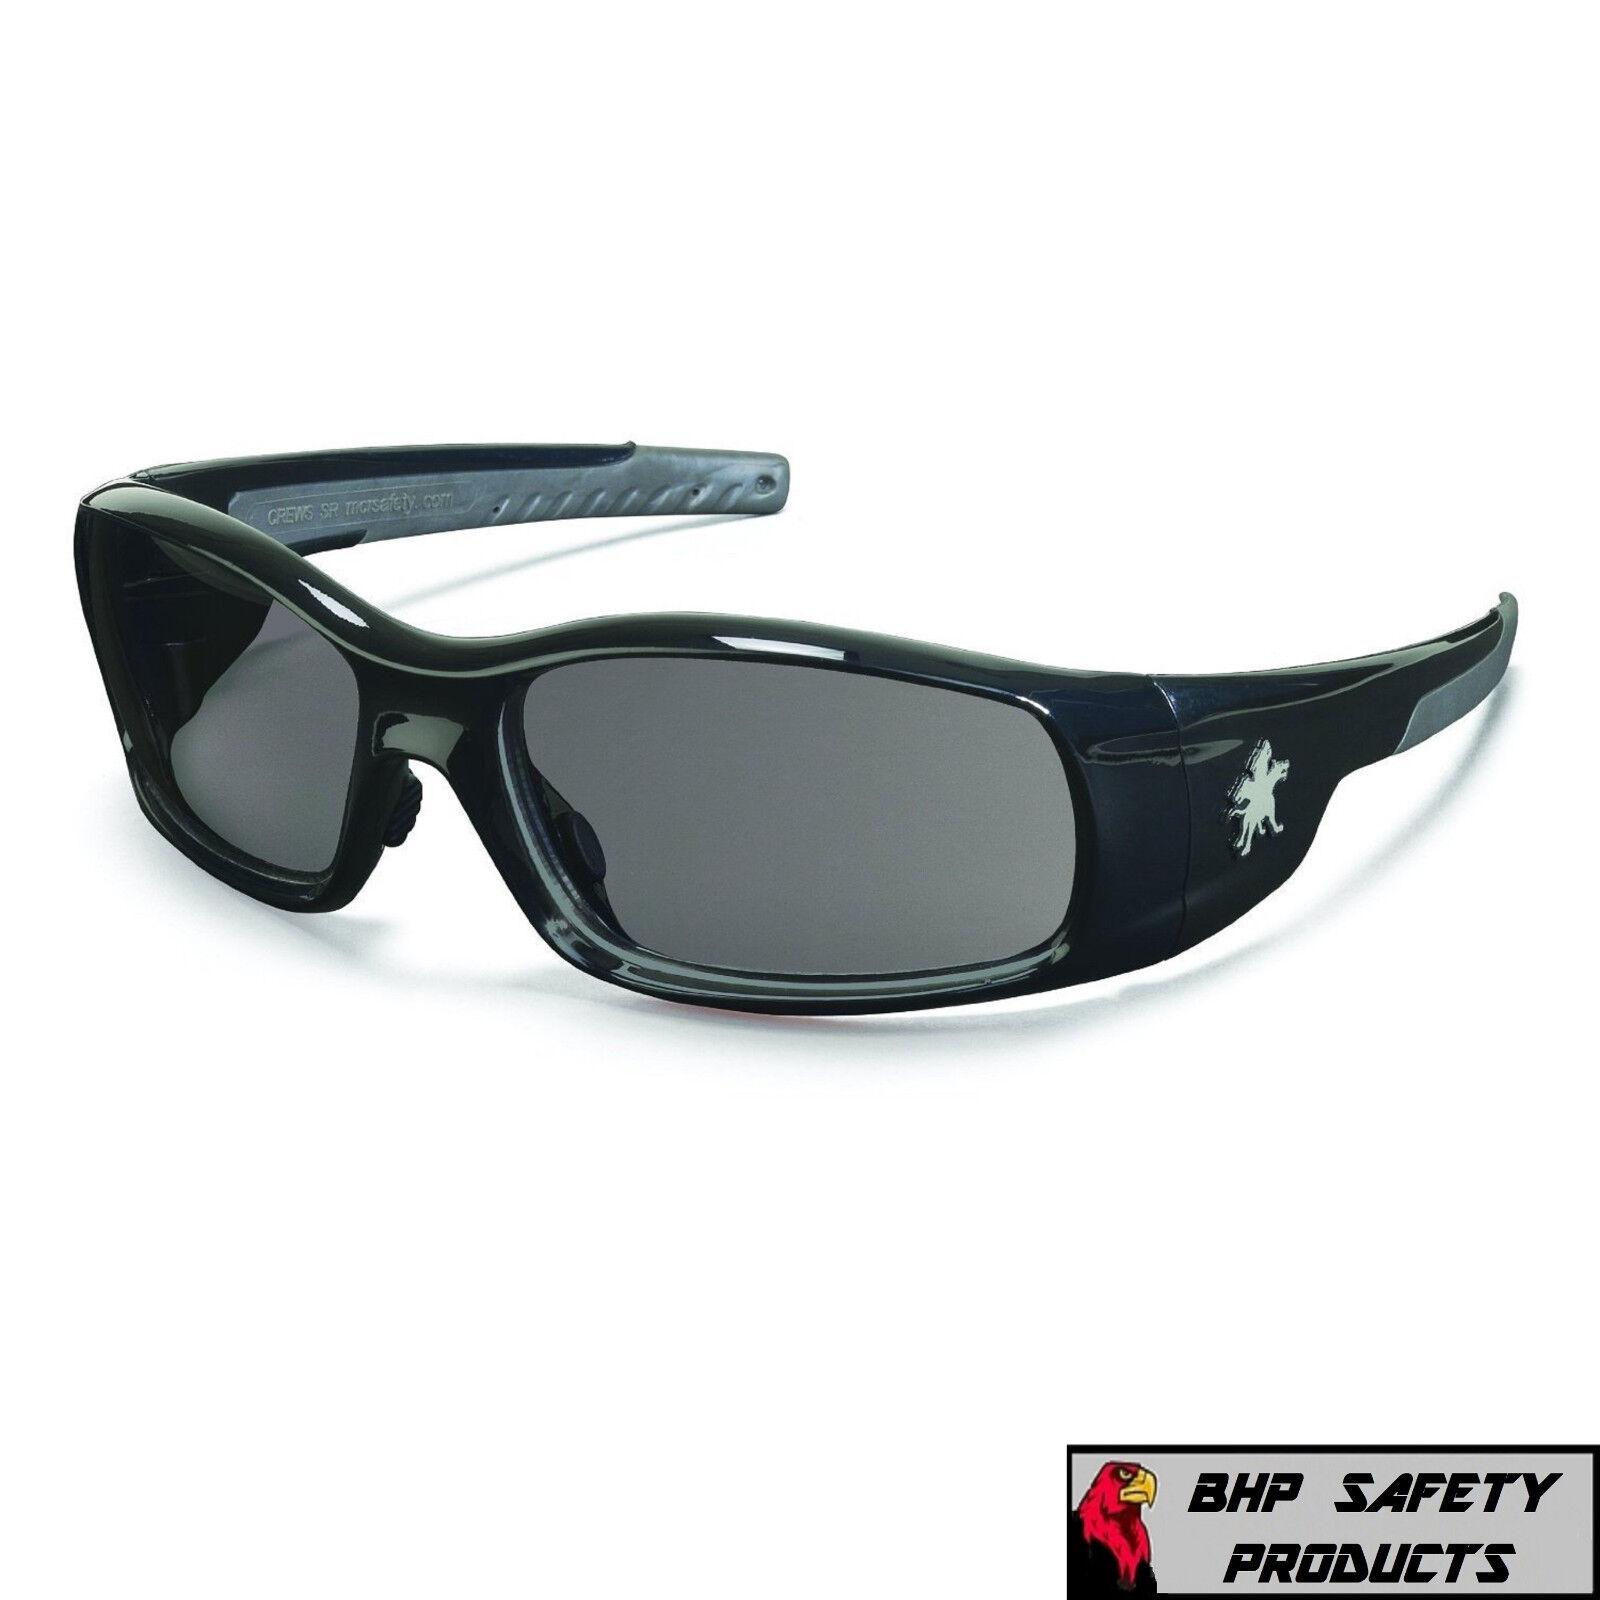 MCR CREWS SWAGGER SAFETY GLASSES SUNGLASSES WORK SPORT EYEWEAR CHOOSE YOUR COLOR SR112 GRAY LENS/BLACK FRAME